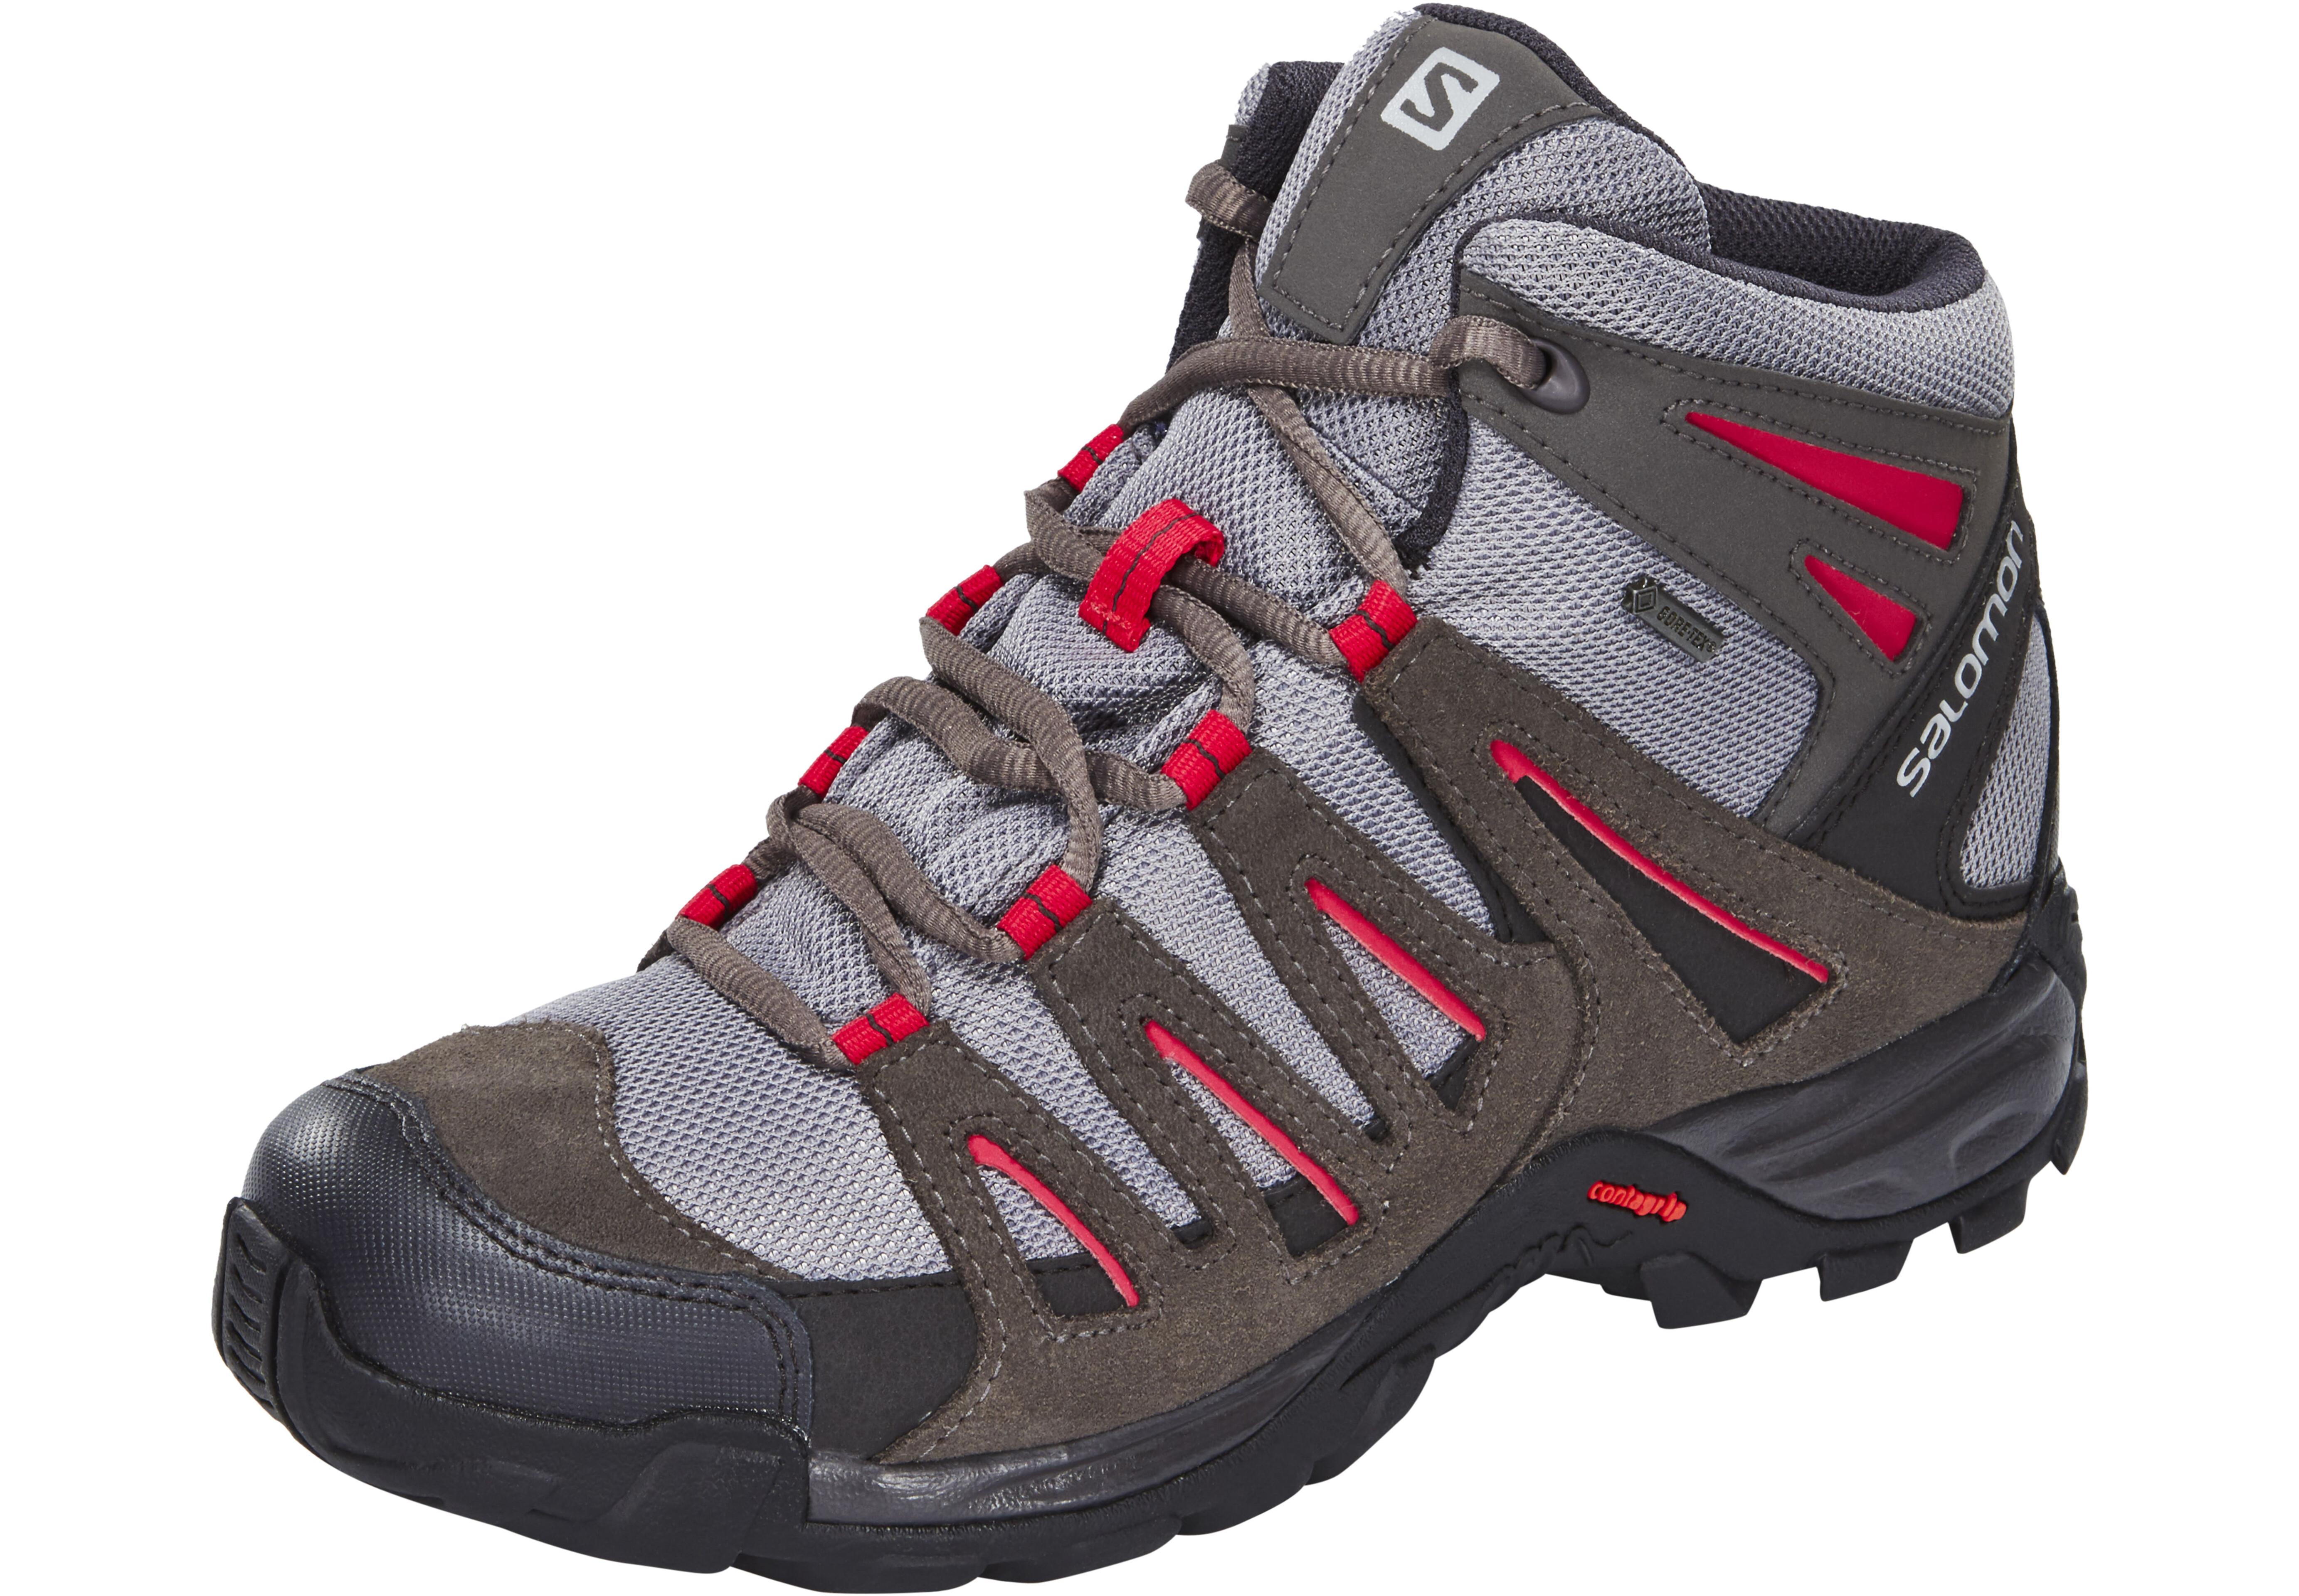 competitive price 7b249 09e2d Salomon Ridgeback Mid GTX Shoes Women detroit/autobahn/lotus